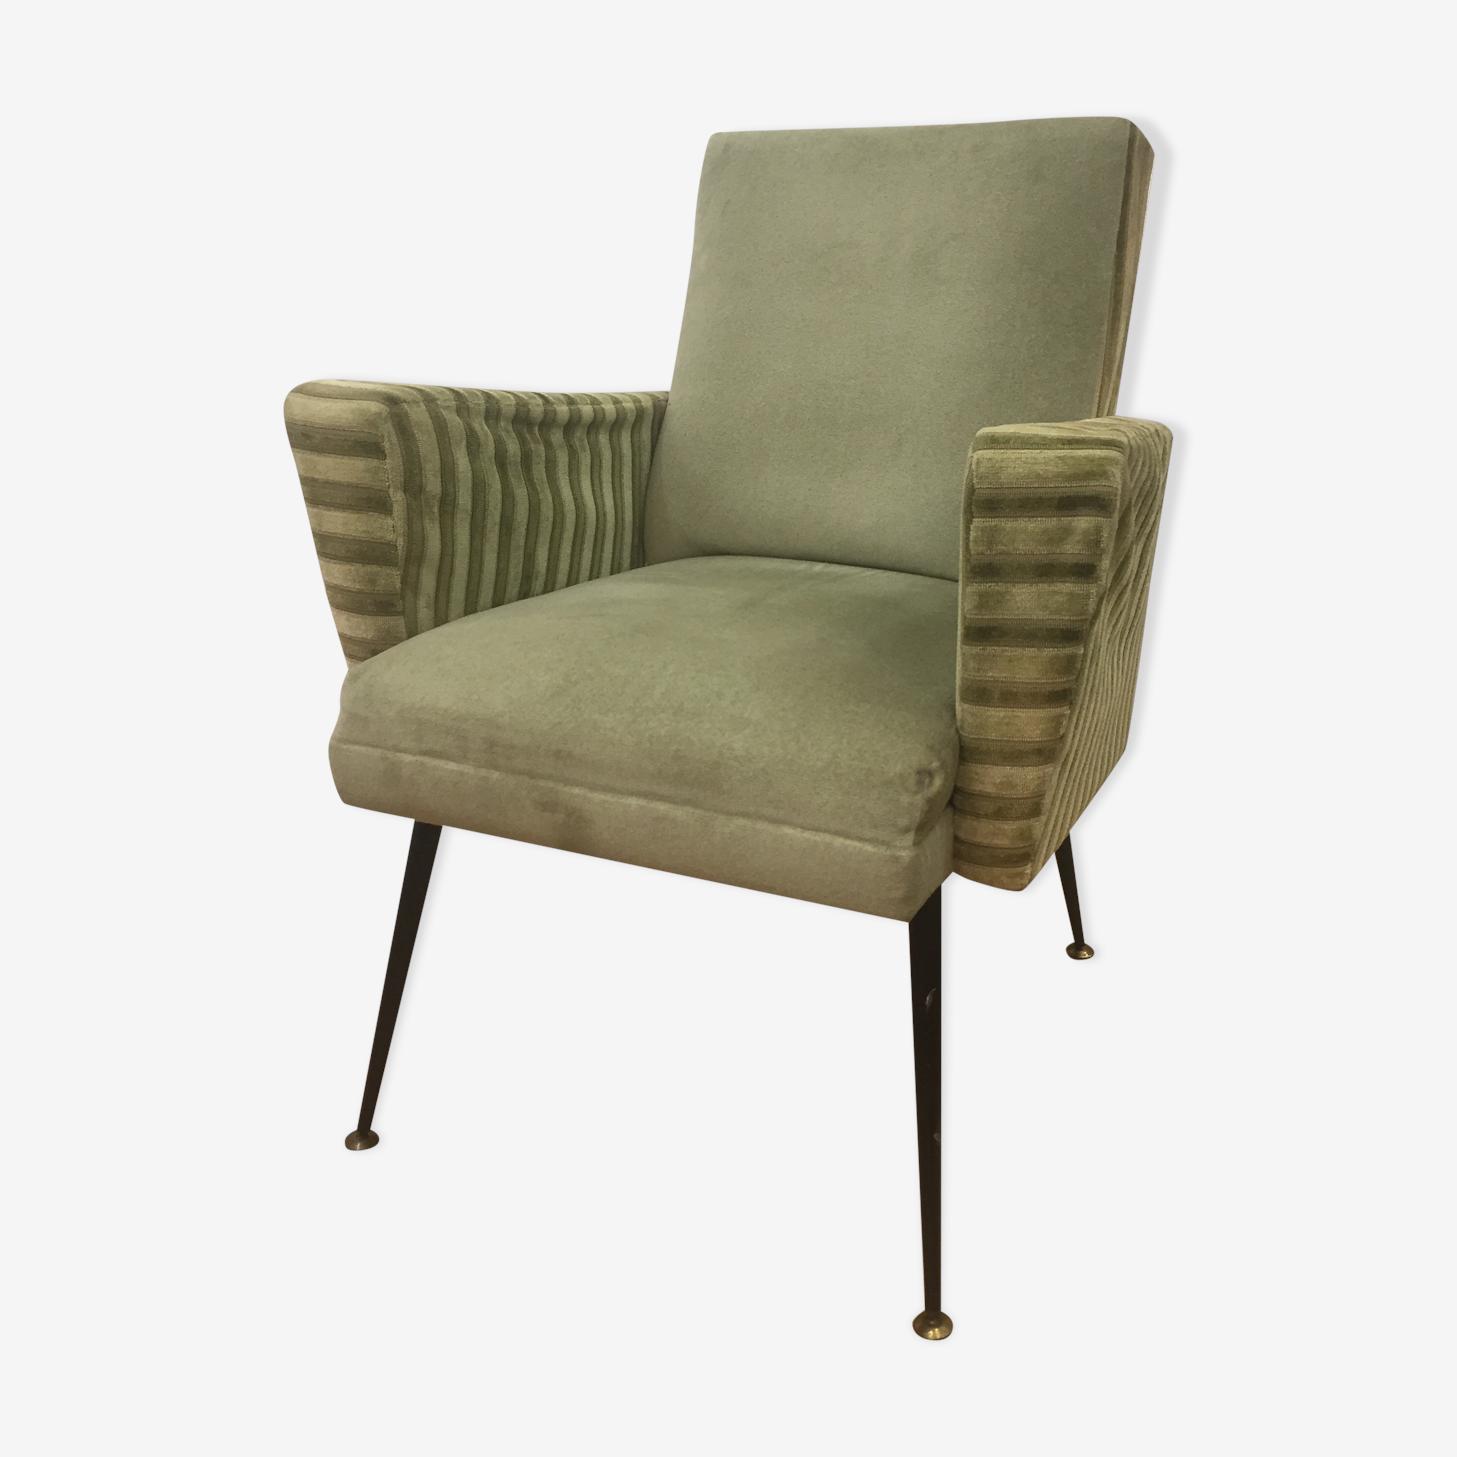 Fauteuil design italien 1960 tissu vert vintage WDsiAXr